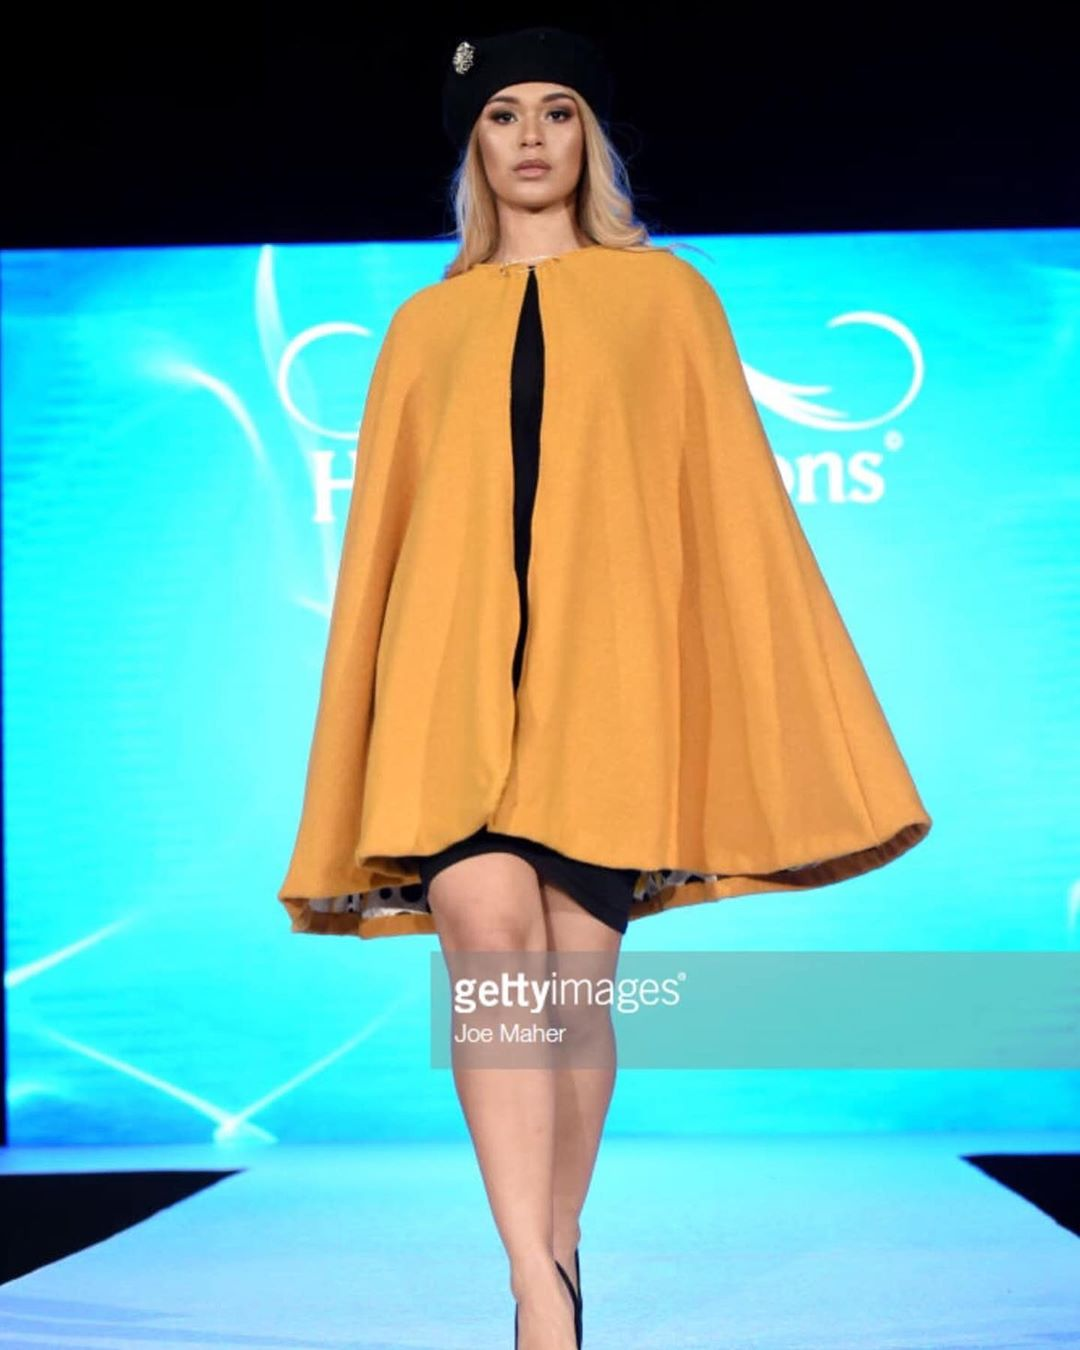 House of iKons DURING London Fashion Week February 2019 Image courtesy of @gettyimages Designer: @areneefashion Model: @oriennebrown HMUA Sponsor: @jackieavalon #BeYourSelf #LoveYourSelf #BeYourOwniKon #HouseofiKons #LadyK #GlobalPlatform #fashion #music #emerging #designers #artists #talented #instalove #art #beauty #Makeup #Film #TV #MusicVideos #ChildrensFashion #models #runway #iKons #CEO #Producer #MusicDirector #ShineBrightLikeaDiamond